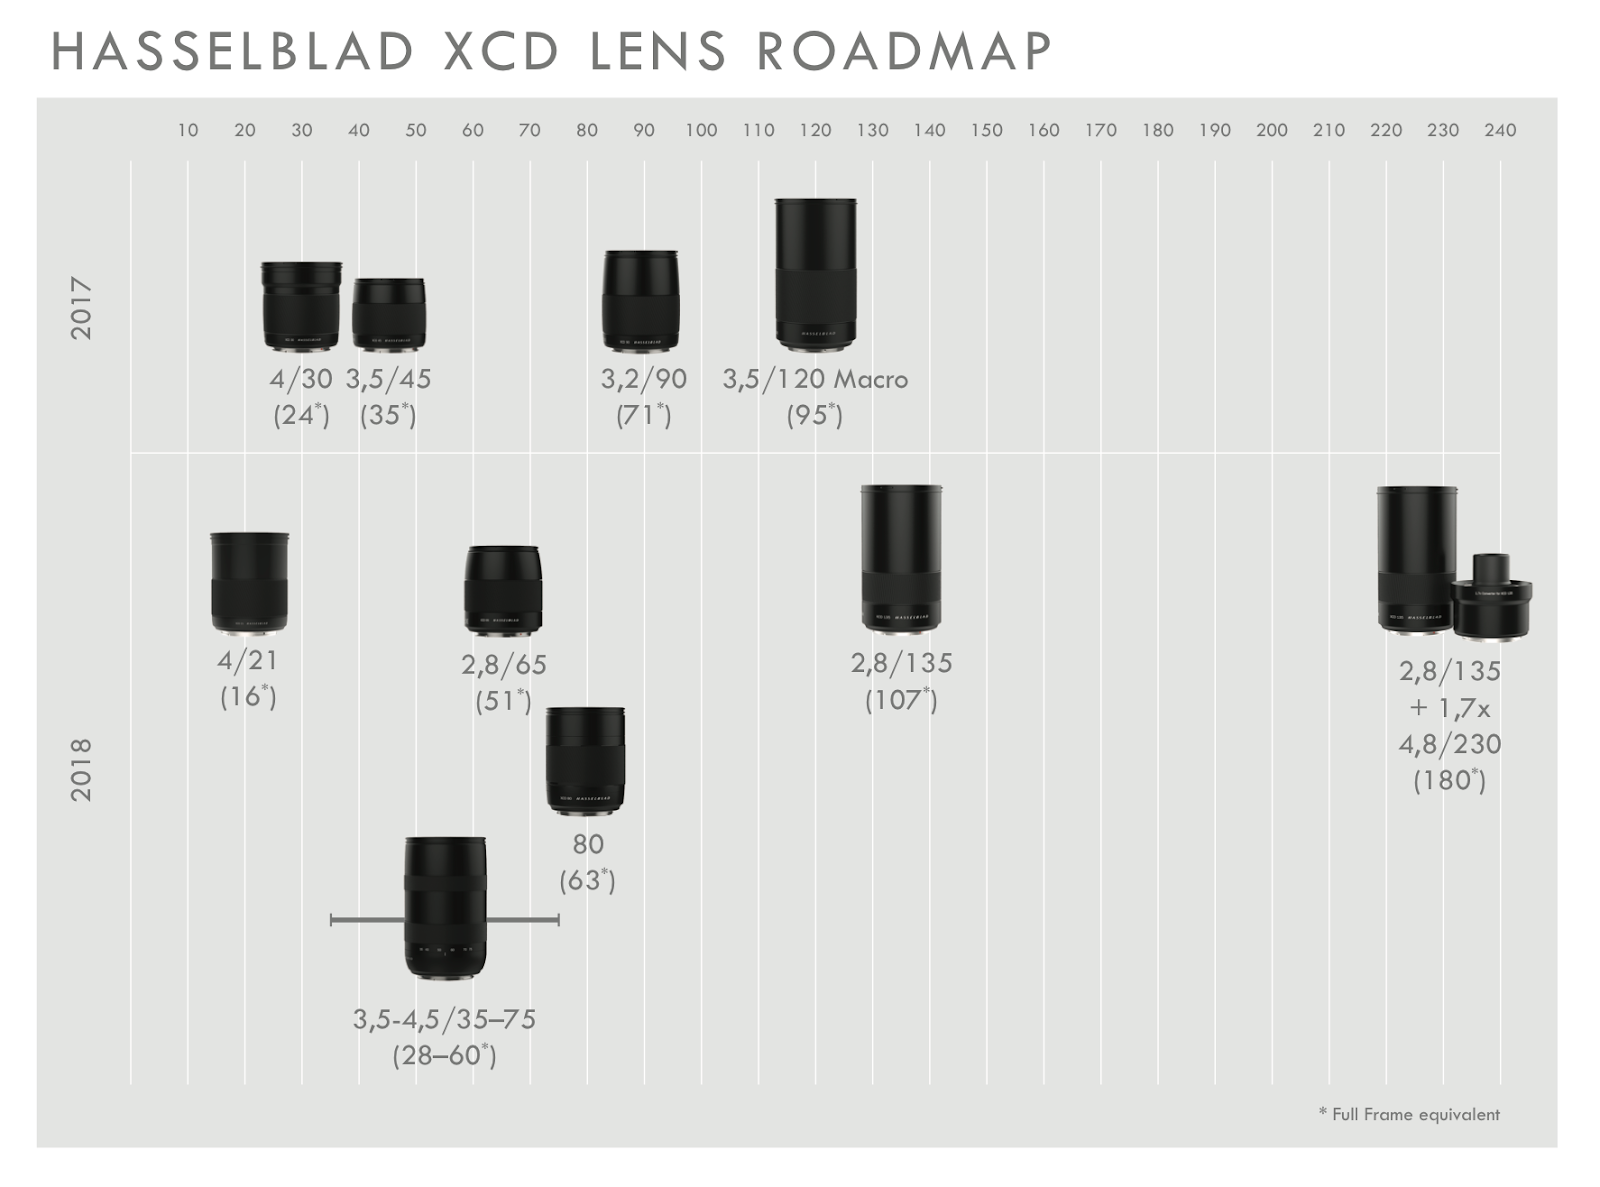 Планы по выпуску объективов Hasselblad XCD